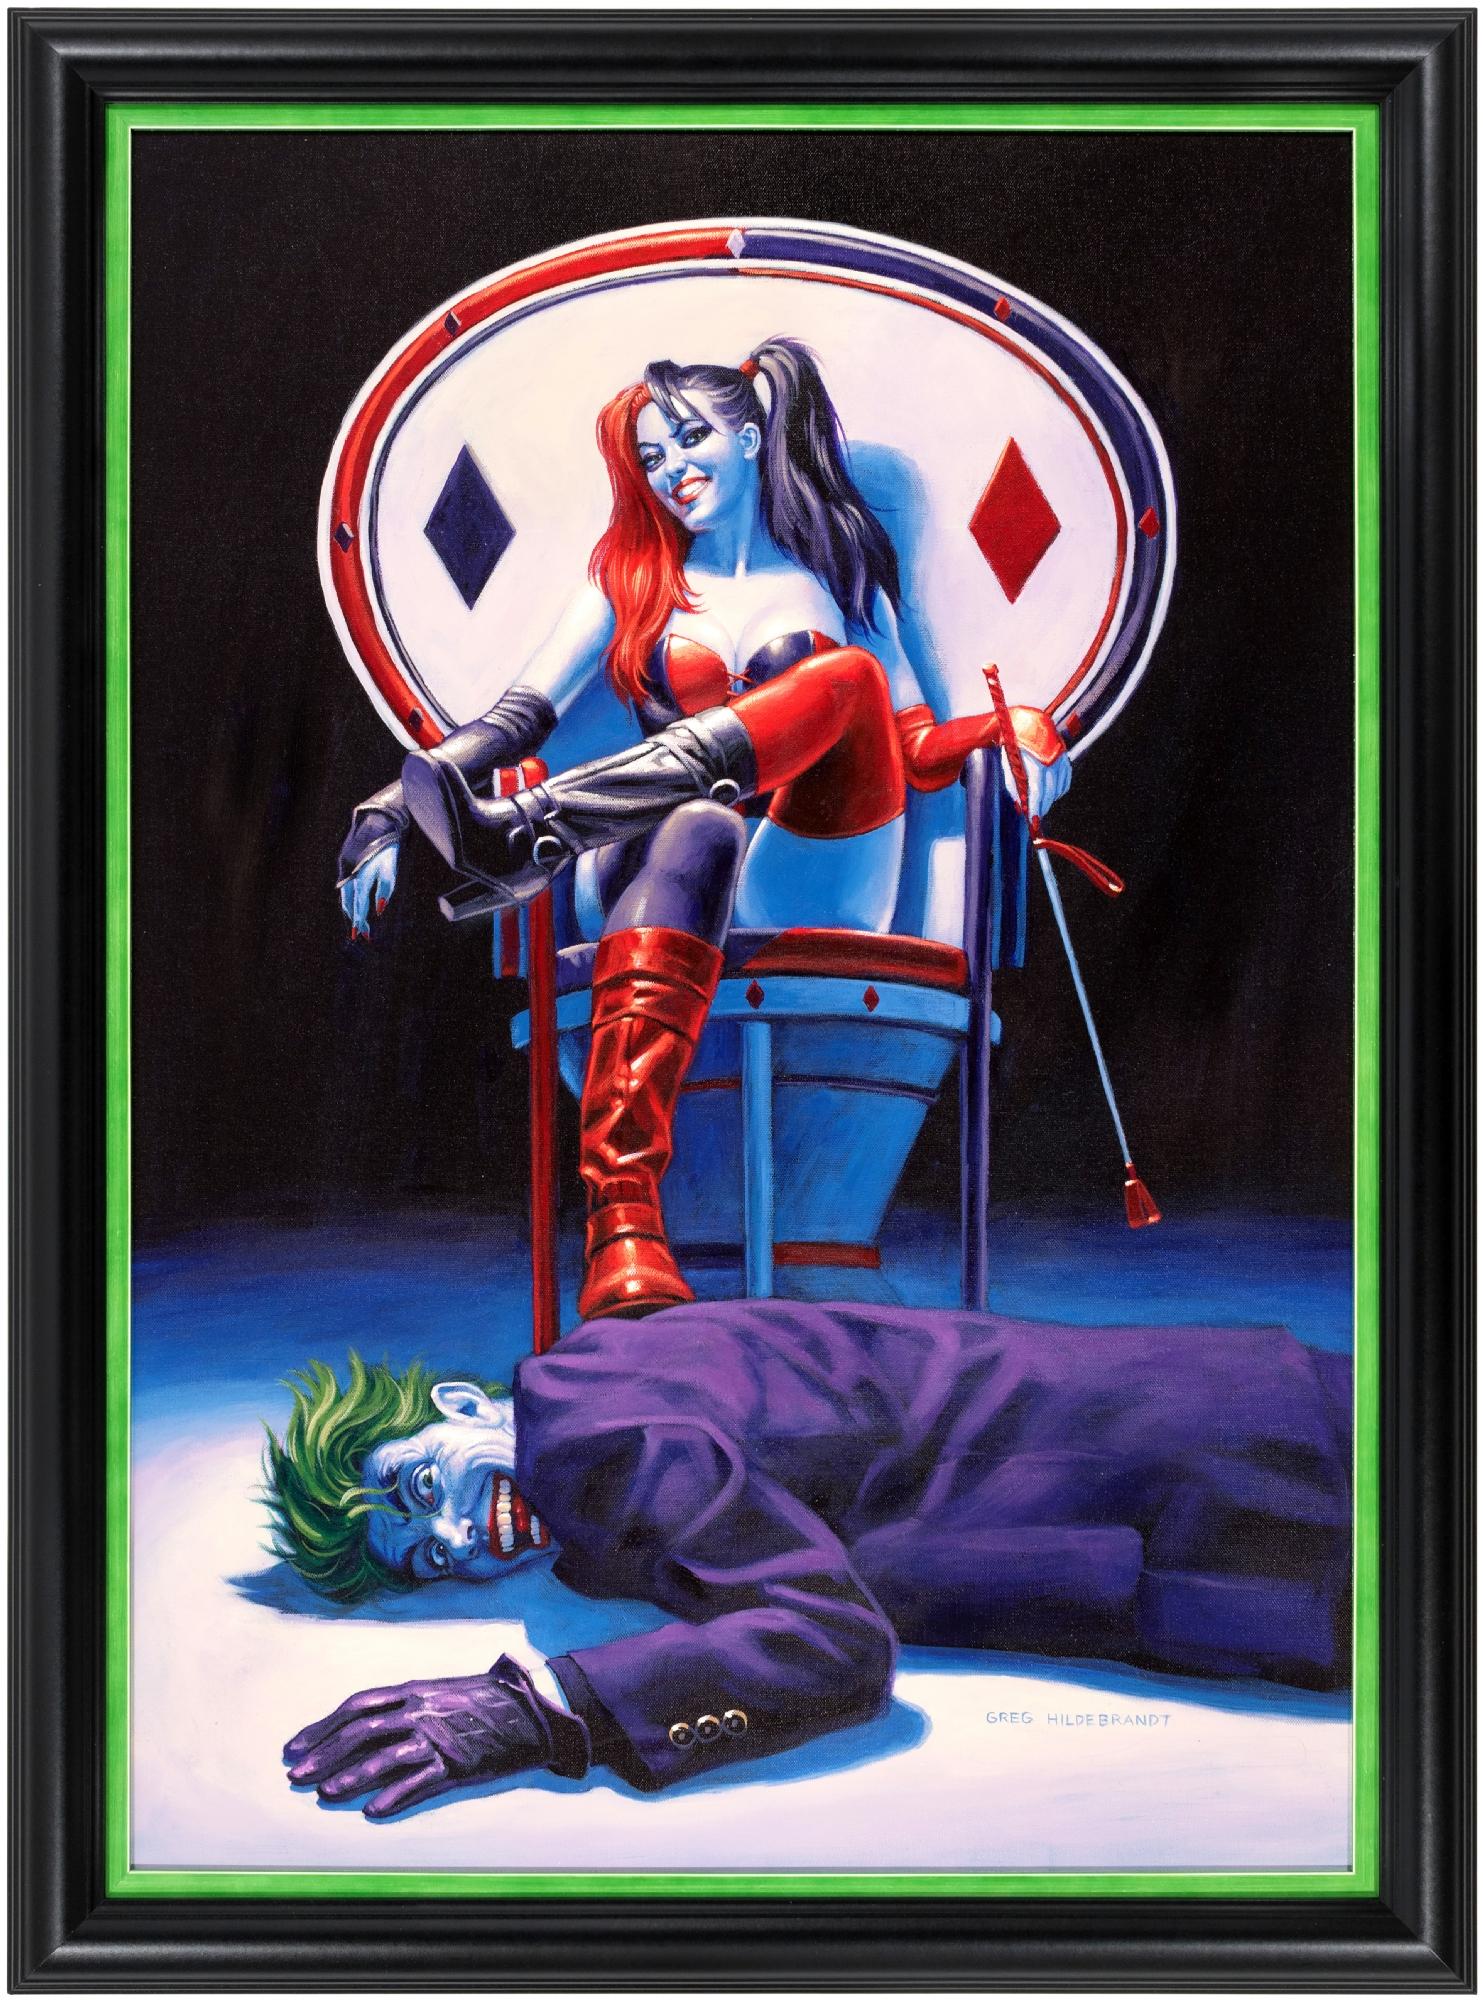 Harley Quinn The Joker Whiplash Original Art Painting By Greg Hildebrandt In Hake S Auctions S Auction Results Comic Art Gallery Room